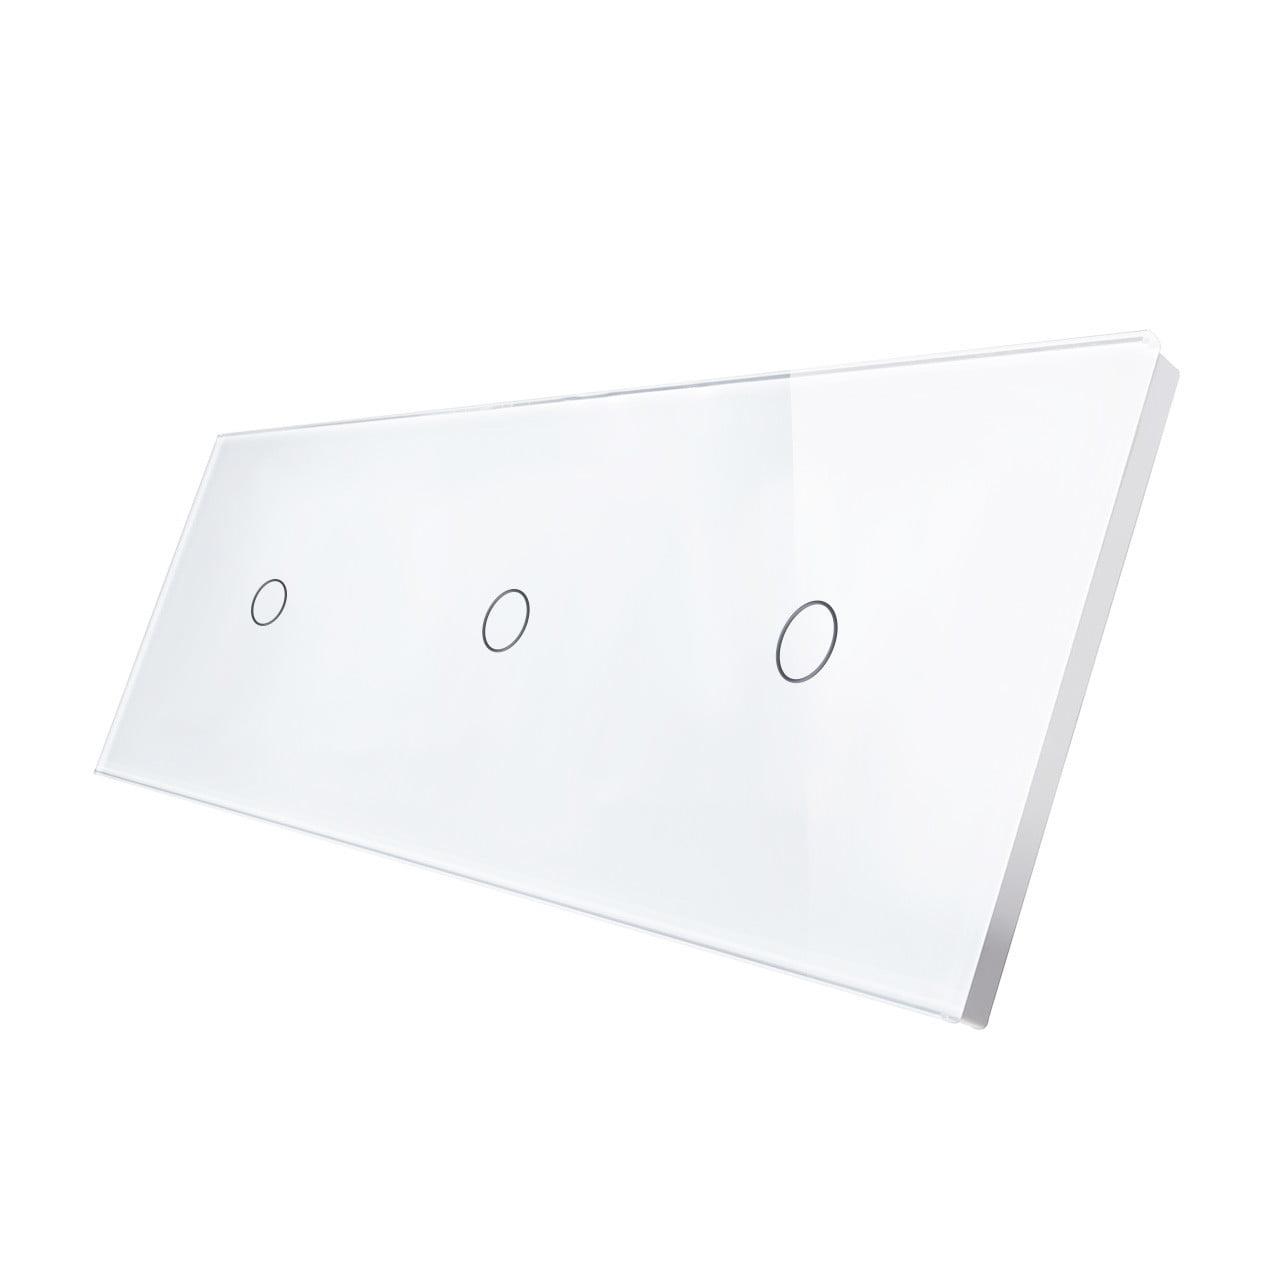 Panou intrerupator touch simplu + simplu + simplu, din sticla, Smart Home